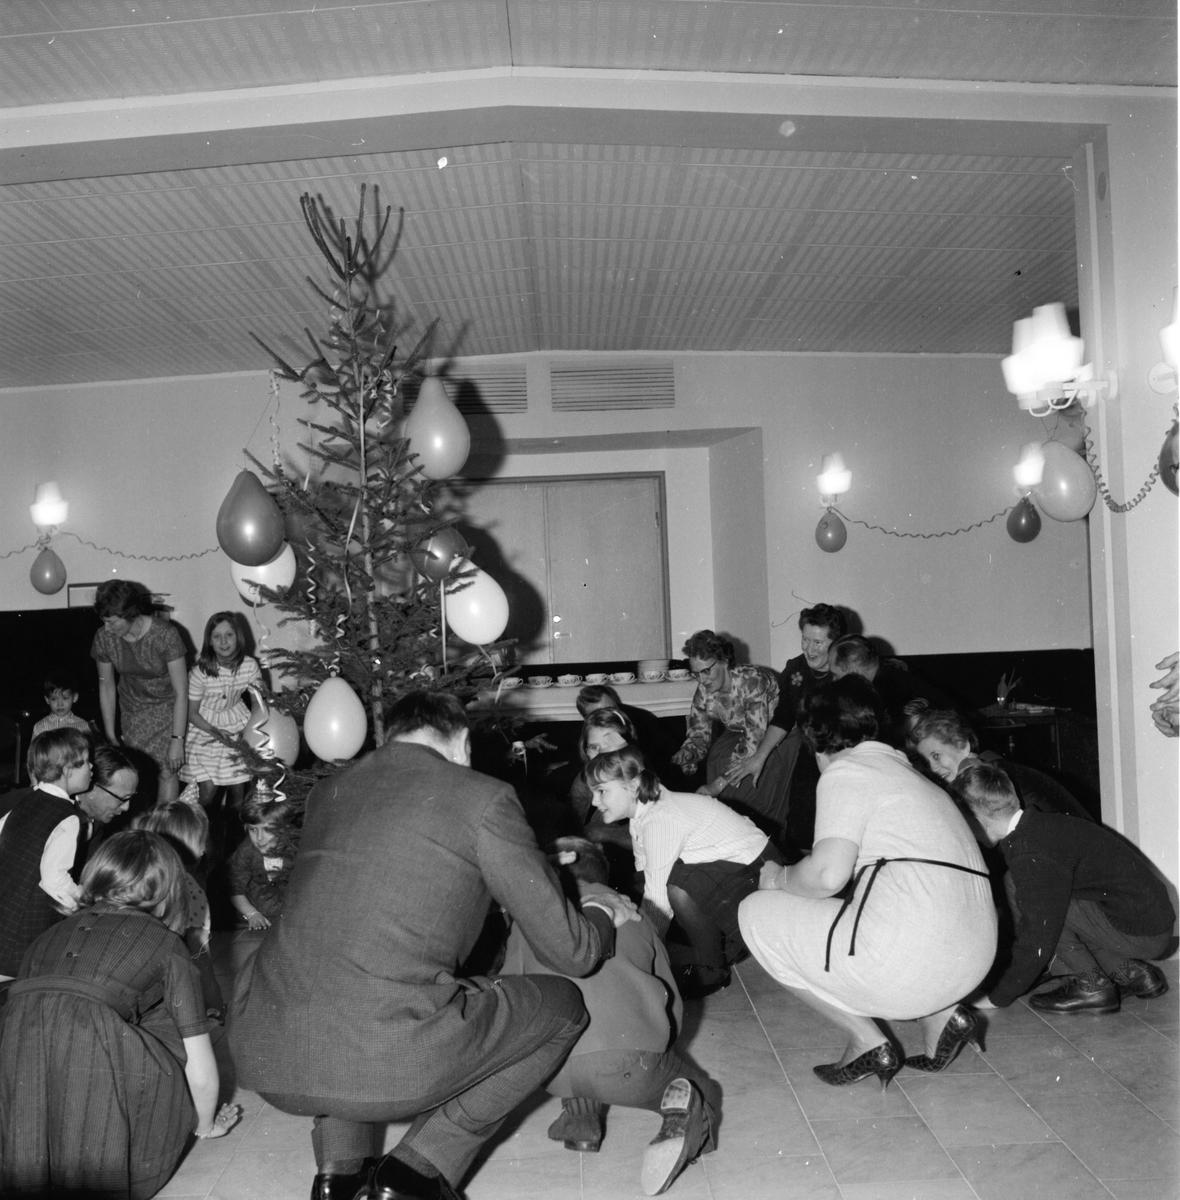 TR-damernas barnfest, 24 Januari 1965